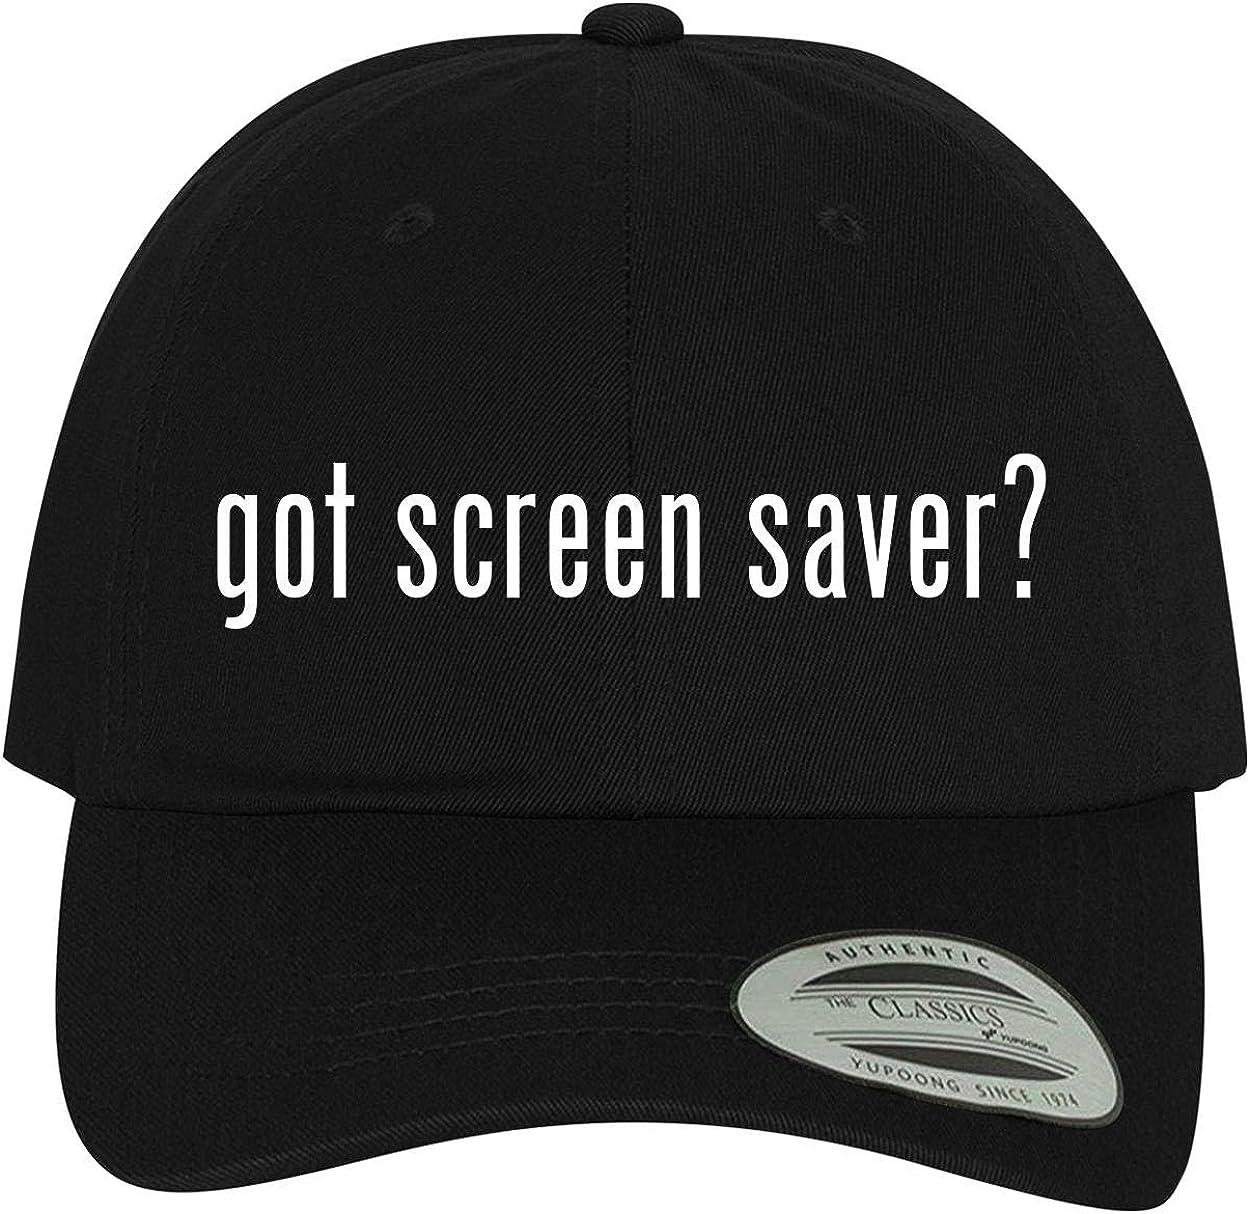 Comfortable Dad Hat Baseball Cap BH Cool Designs got Screen Saver?